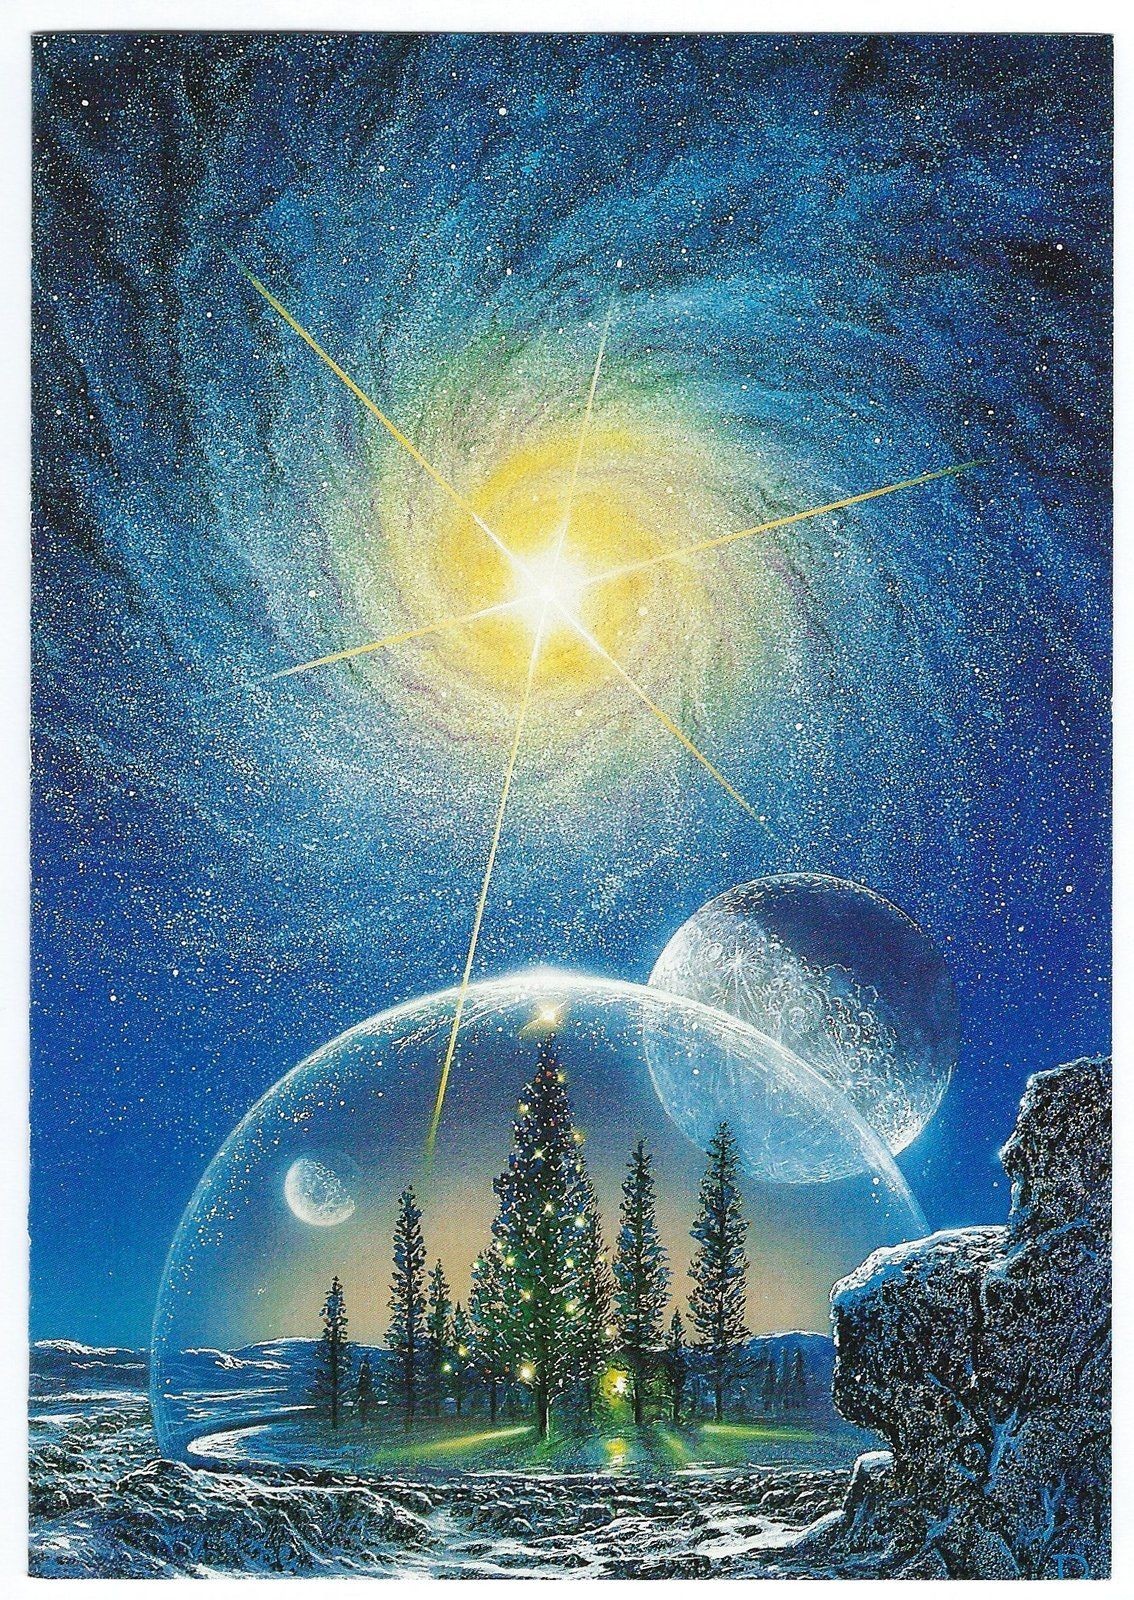 Don dixon space art greeting christmas card novagraphics